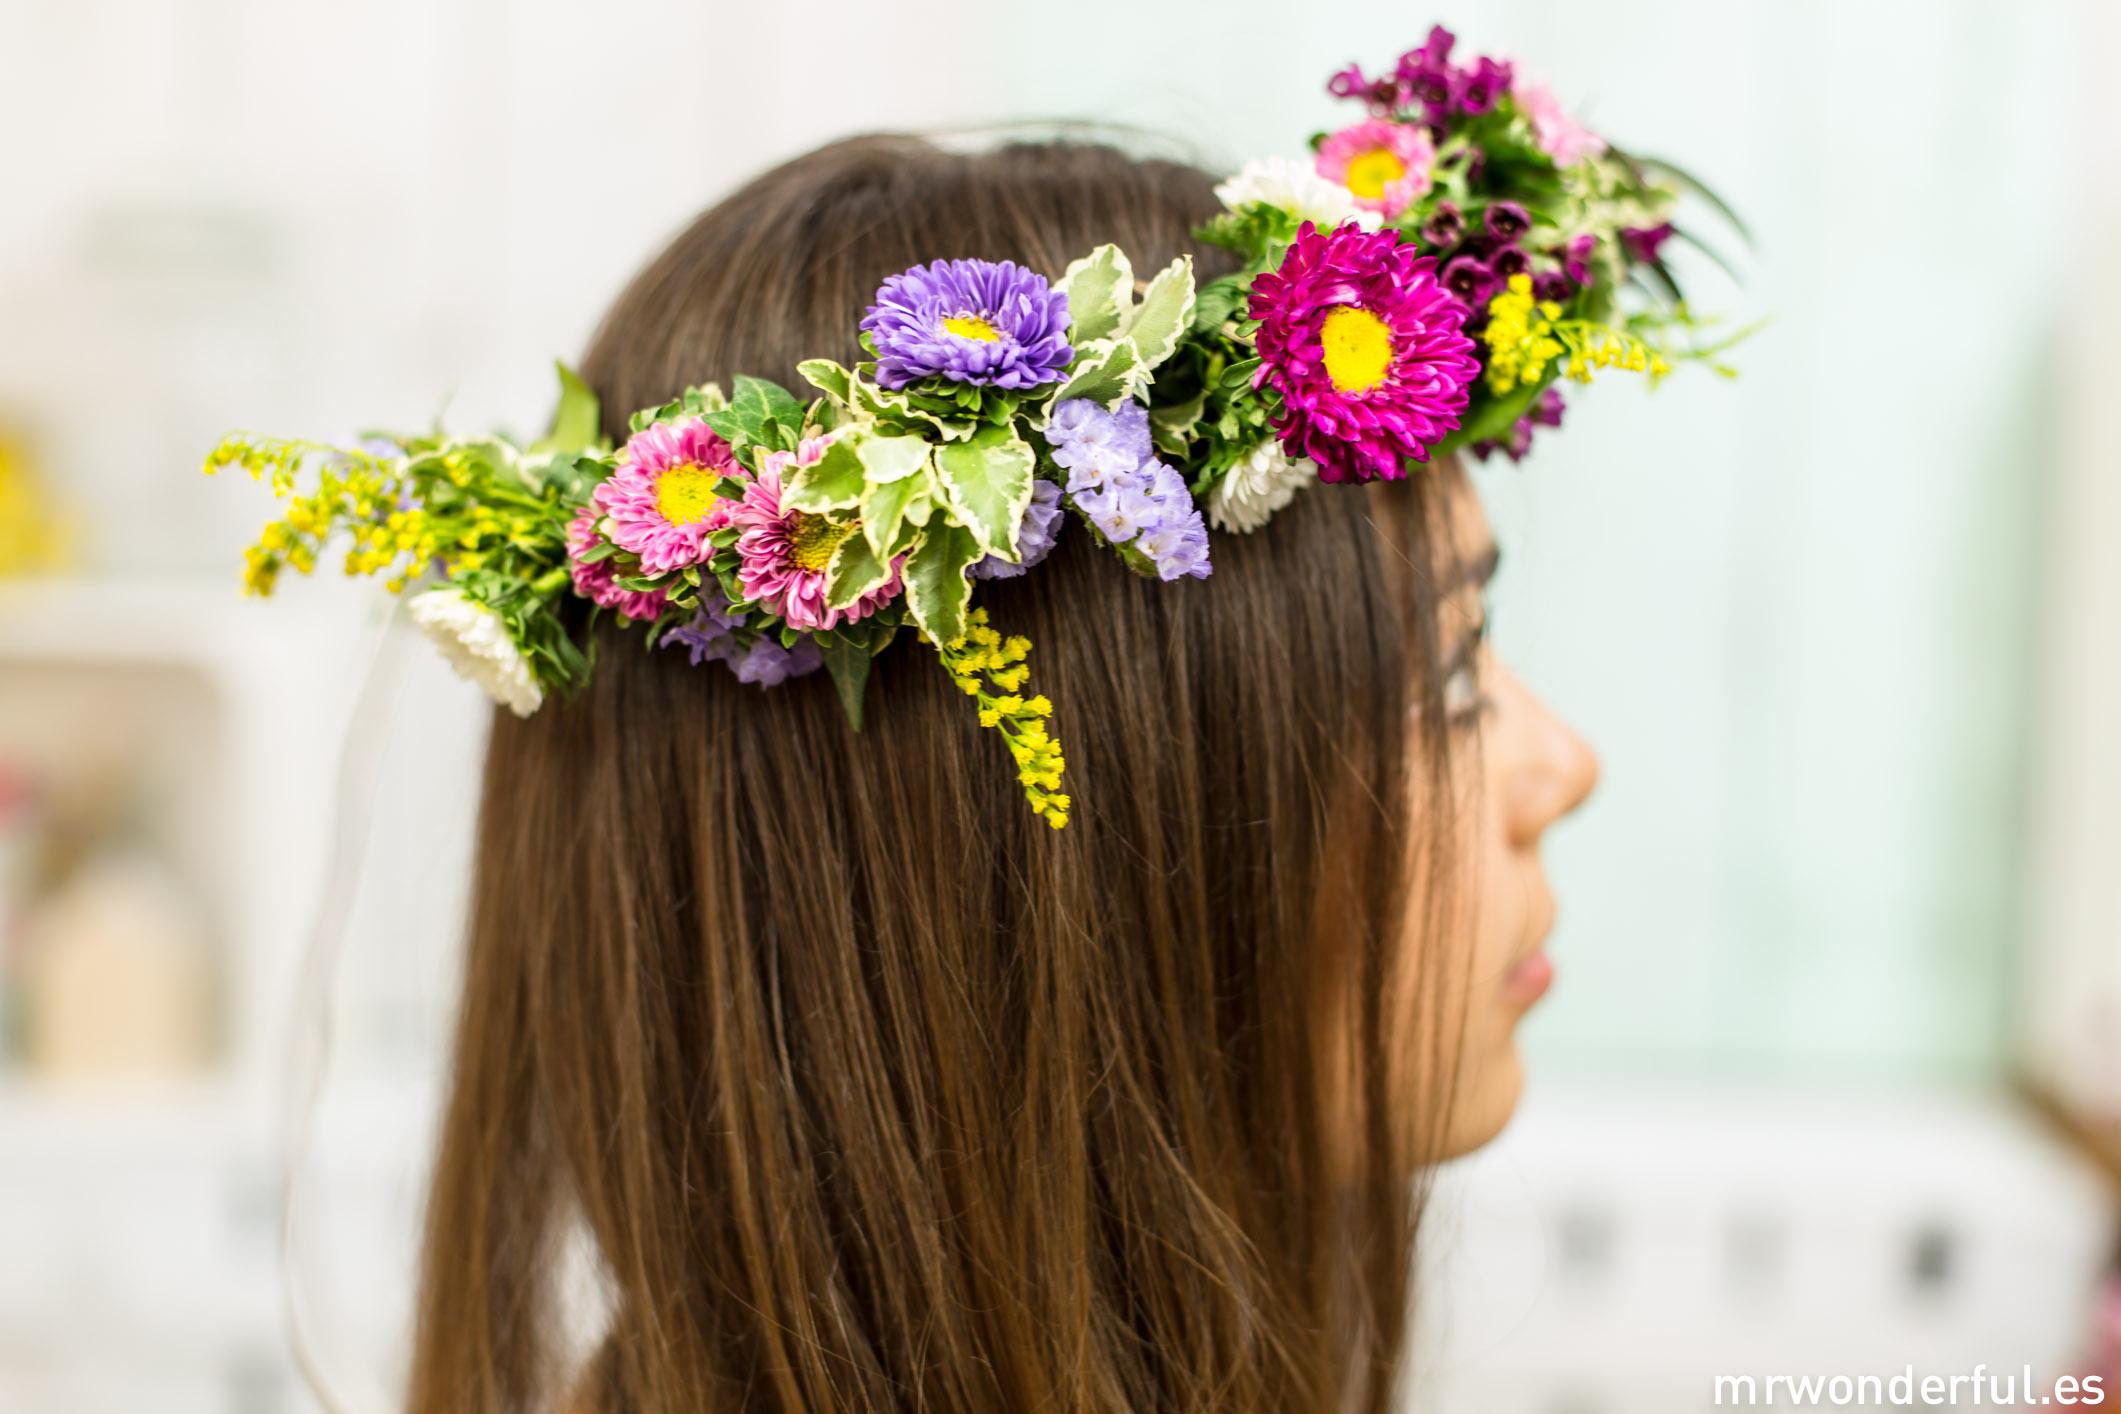 mwonderful_tutorial_corona-flores-167